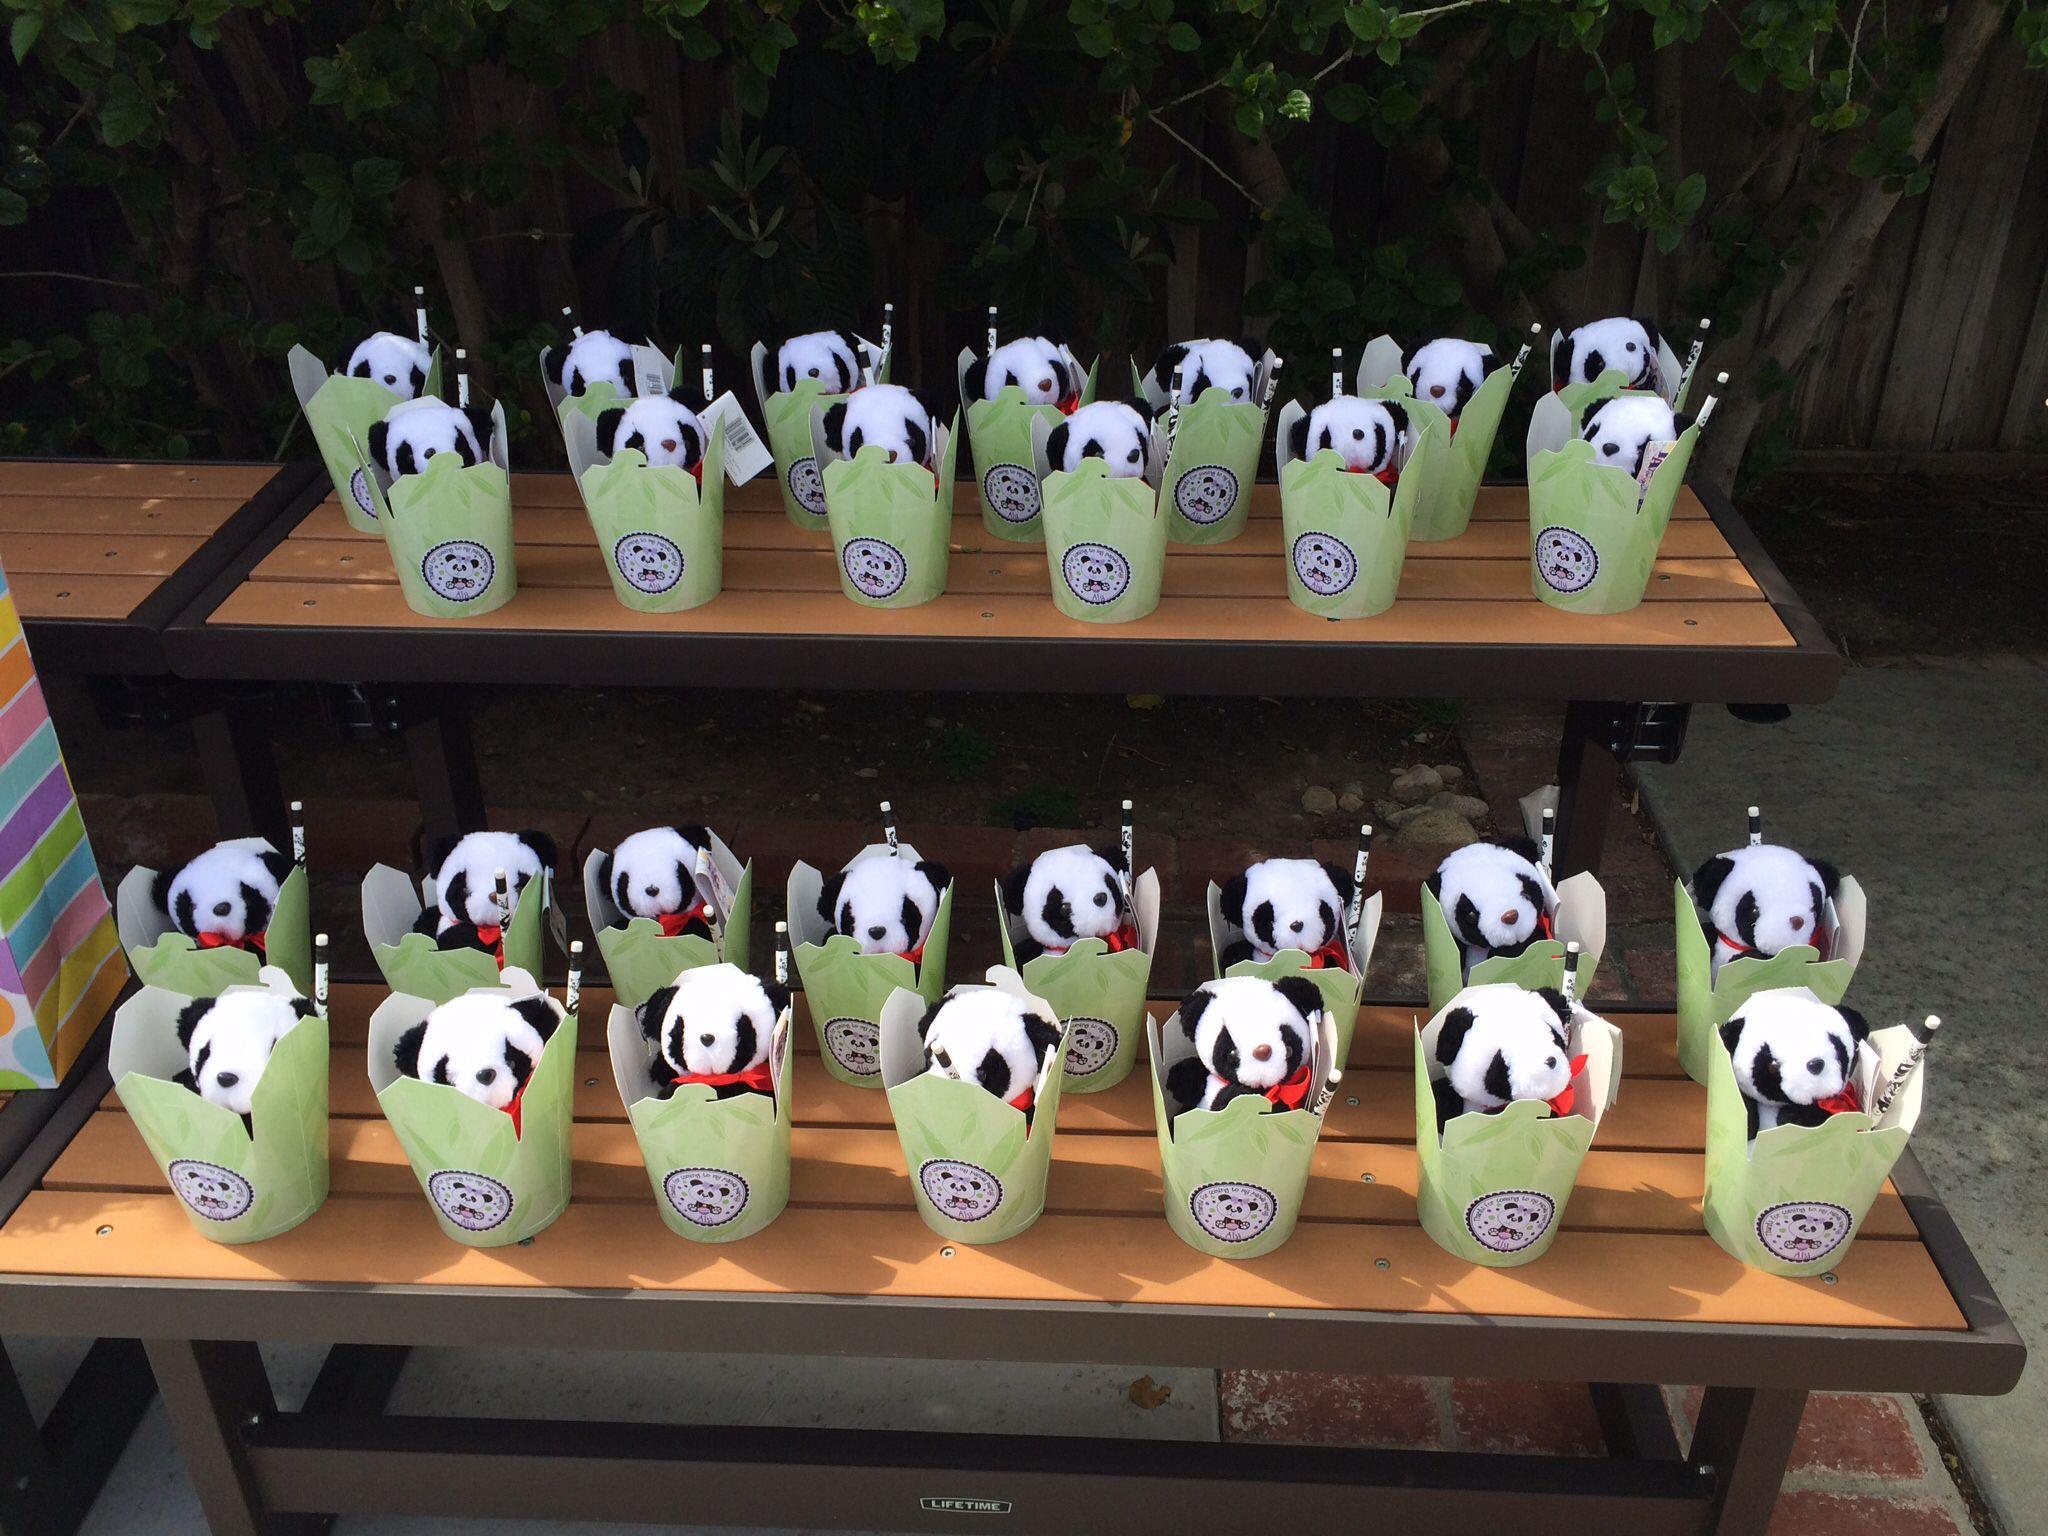 Panda Party Decorations: Panda Party Favors!